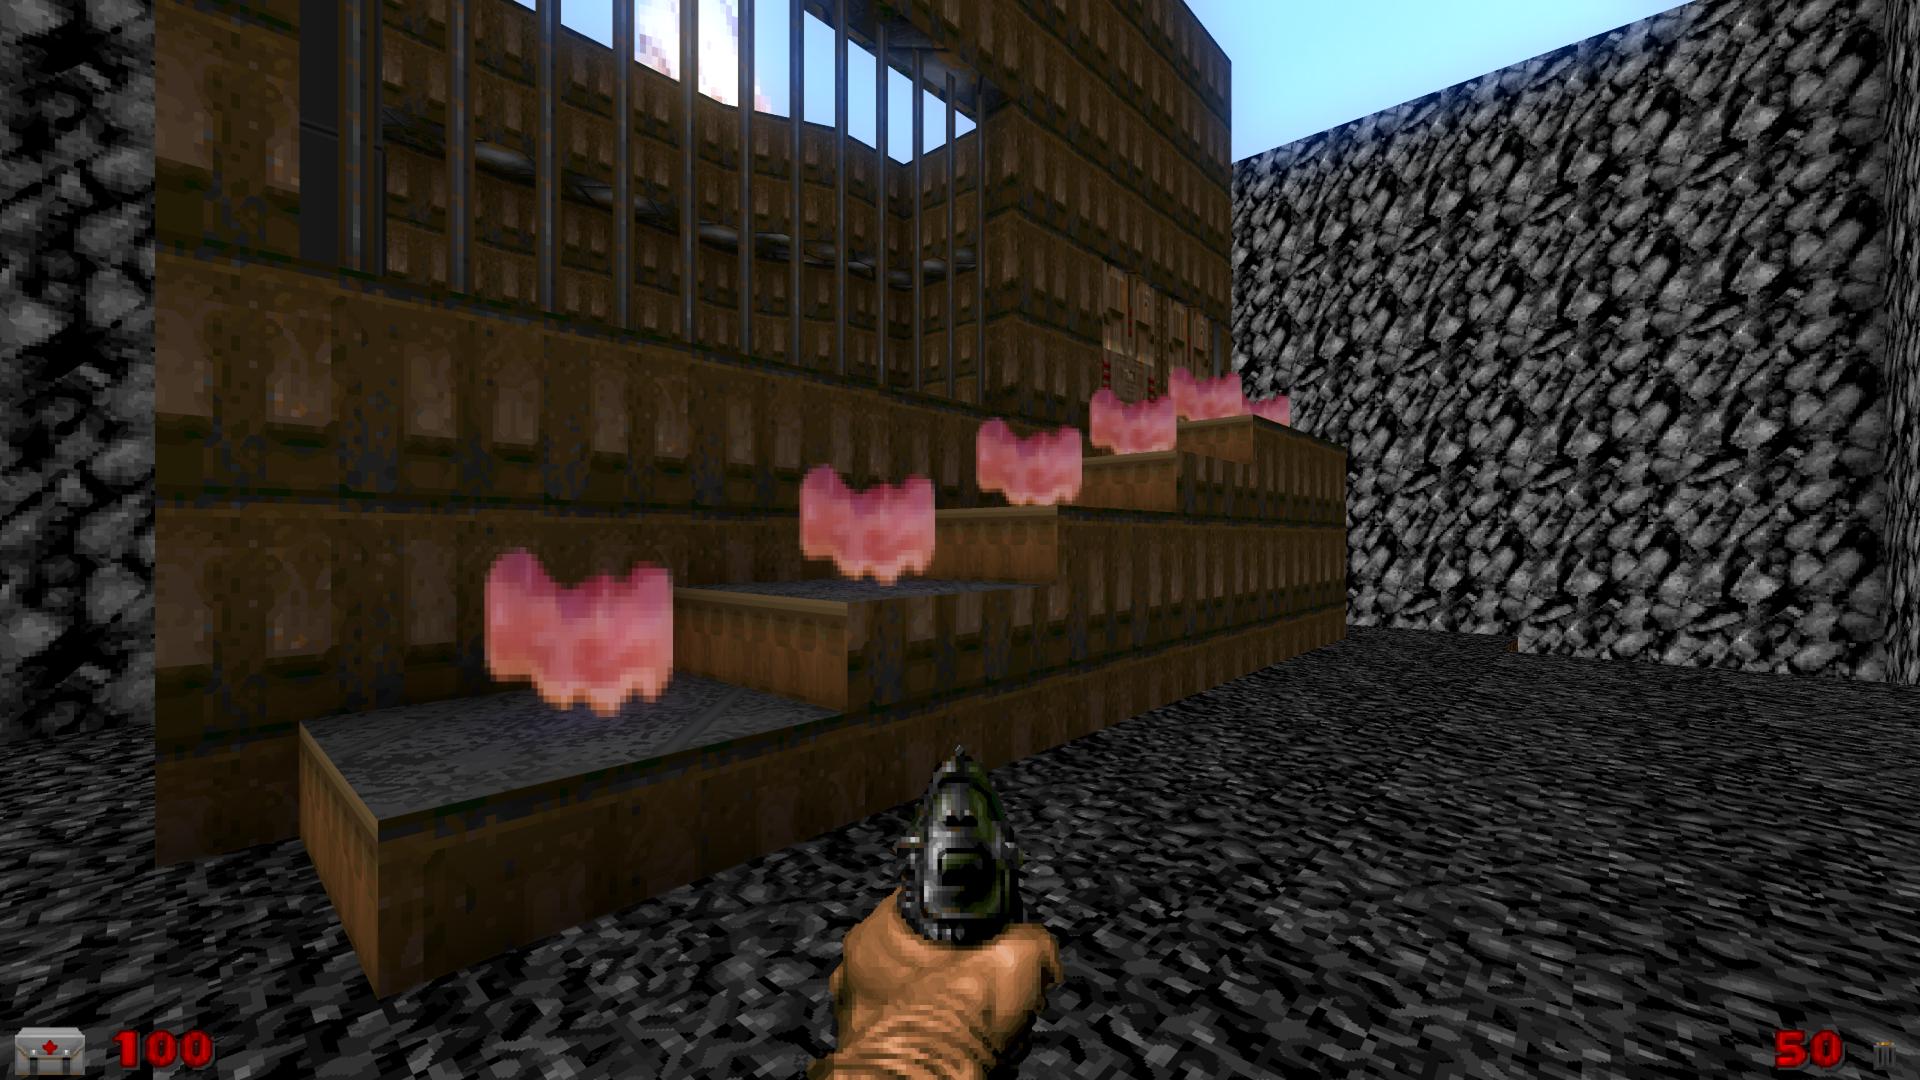 Screenshot_Doom_20210108_105050.png.c97f3cf823a8620936dbe055055bac80.png